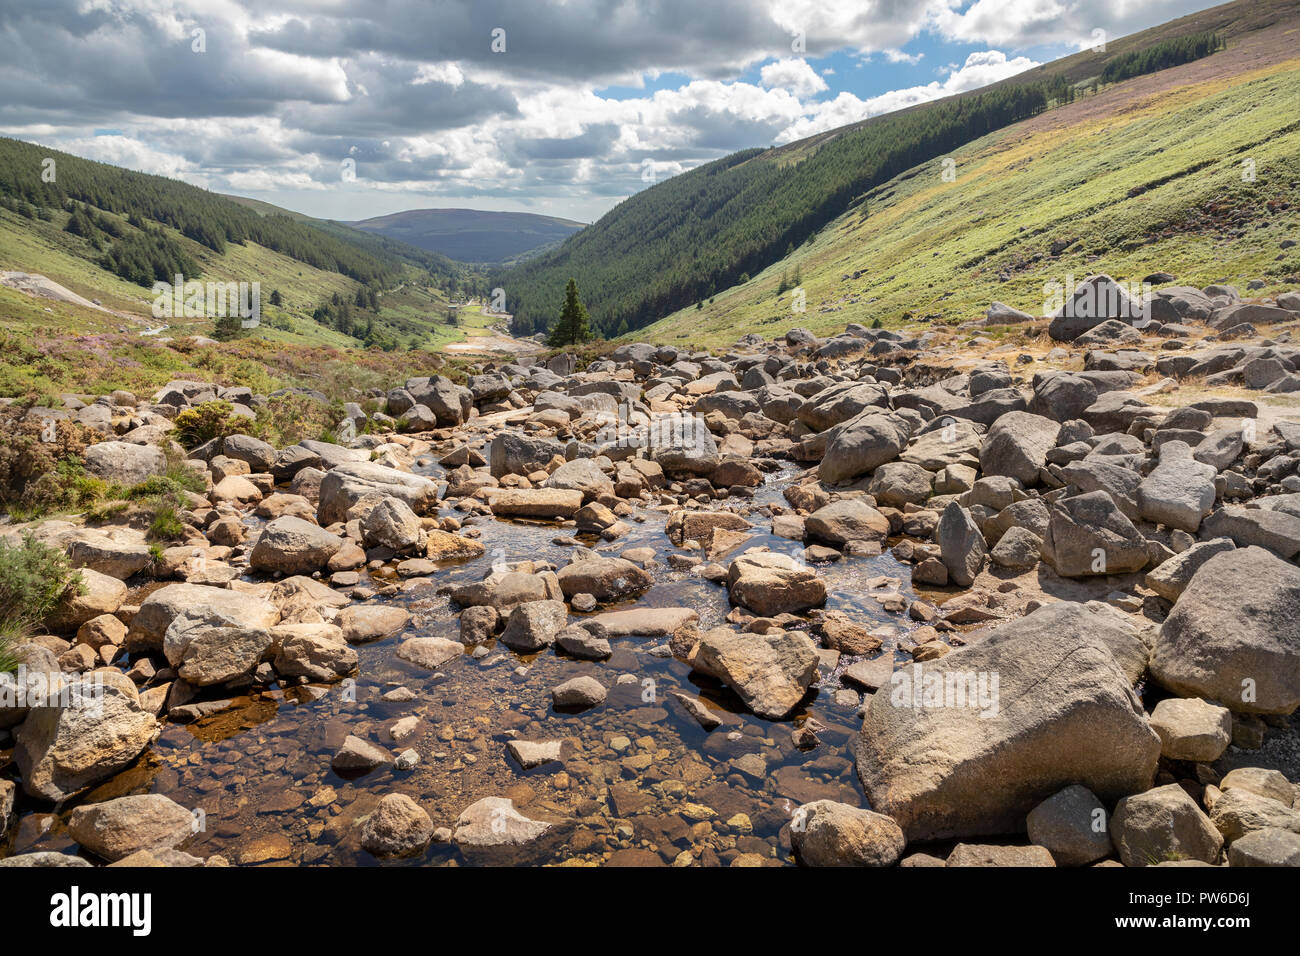 Glendasan Valley, Brockagh, Co. Wicklow, Ireland - Stock Image